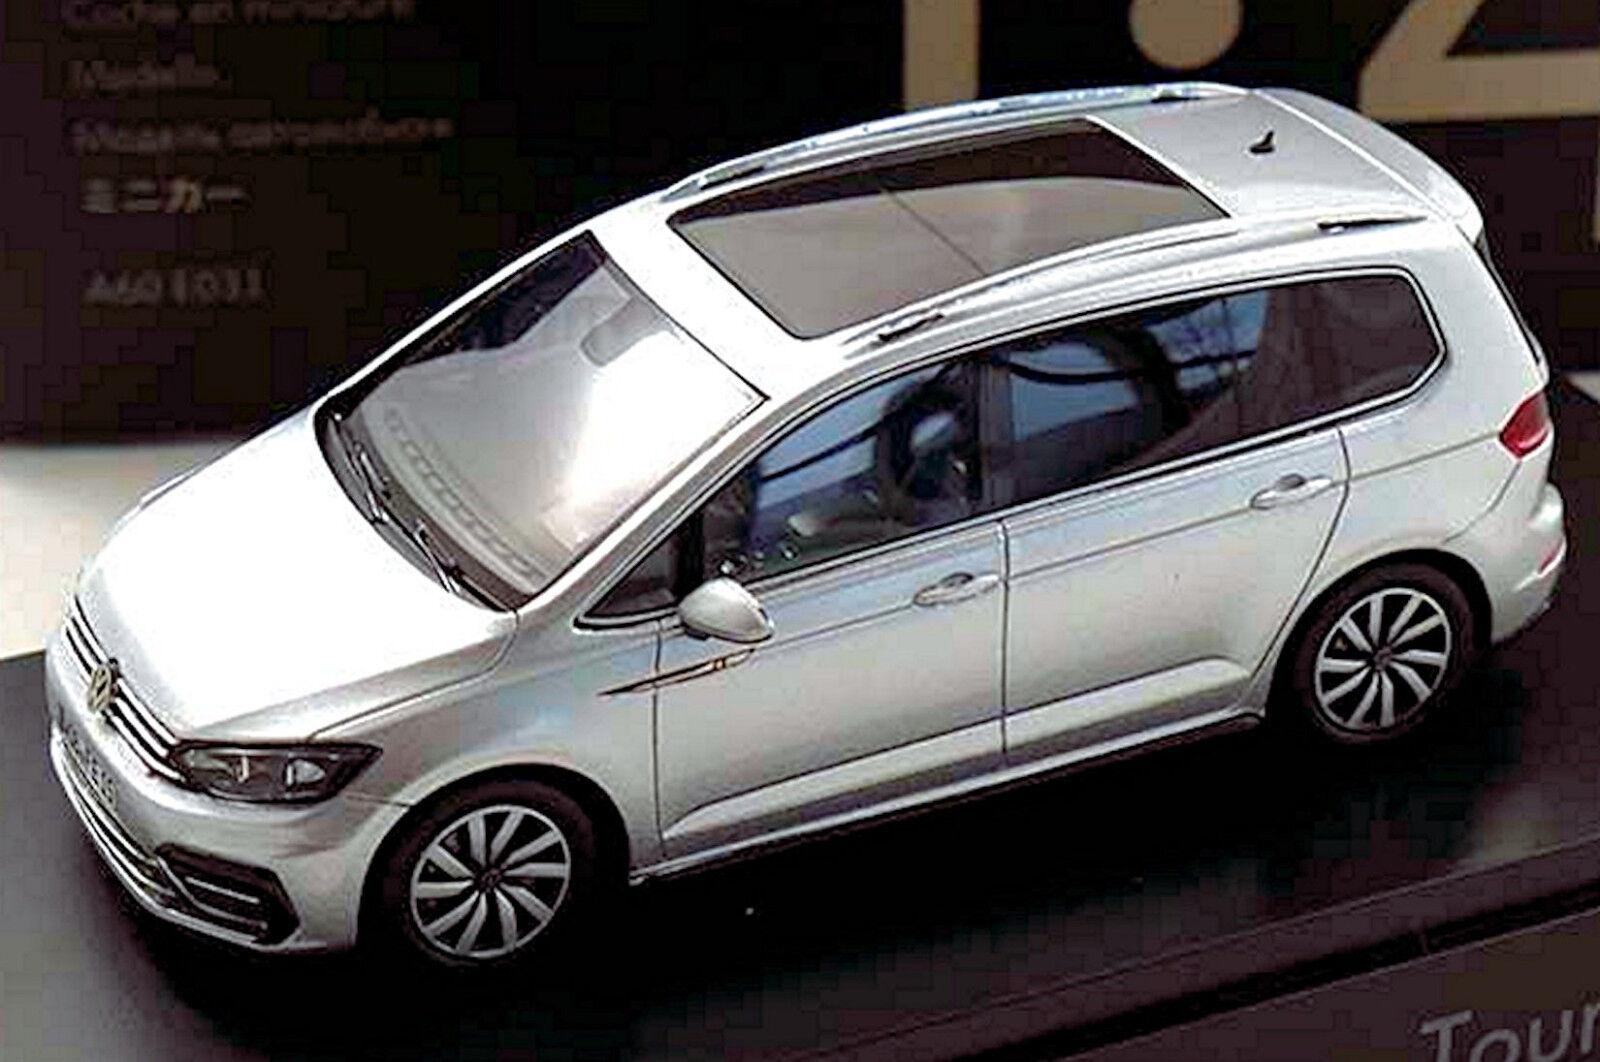 excelentes precios VW VW VW Touran R-Line Touran II Tipo 5T 2015-19 Plata Metálico 1 43 spark  te hará satisfecho